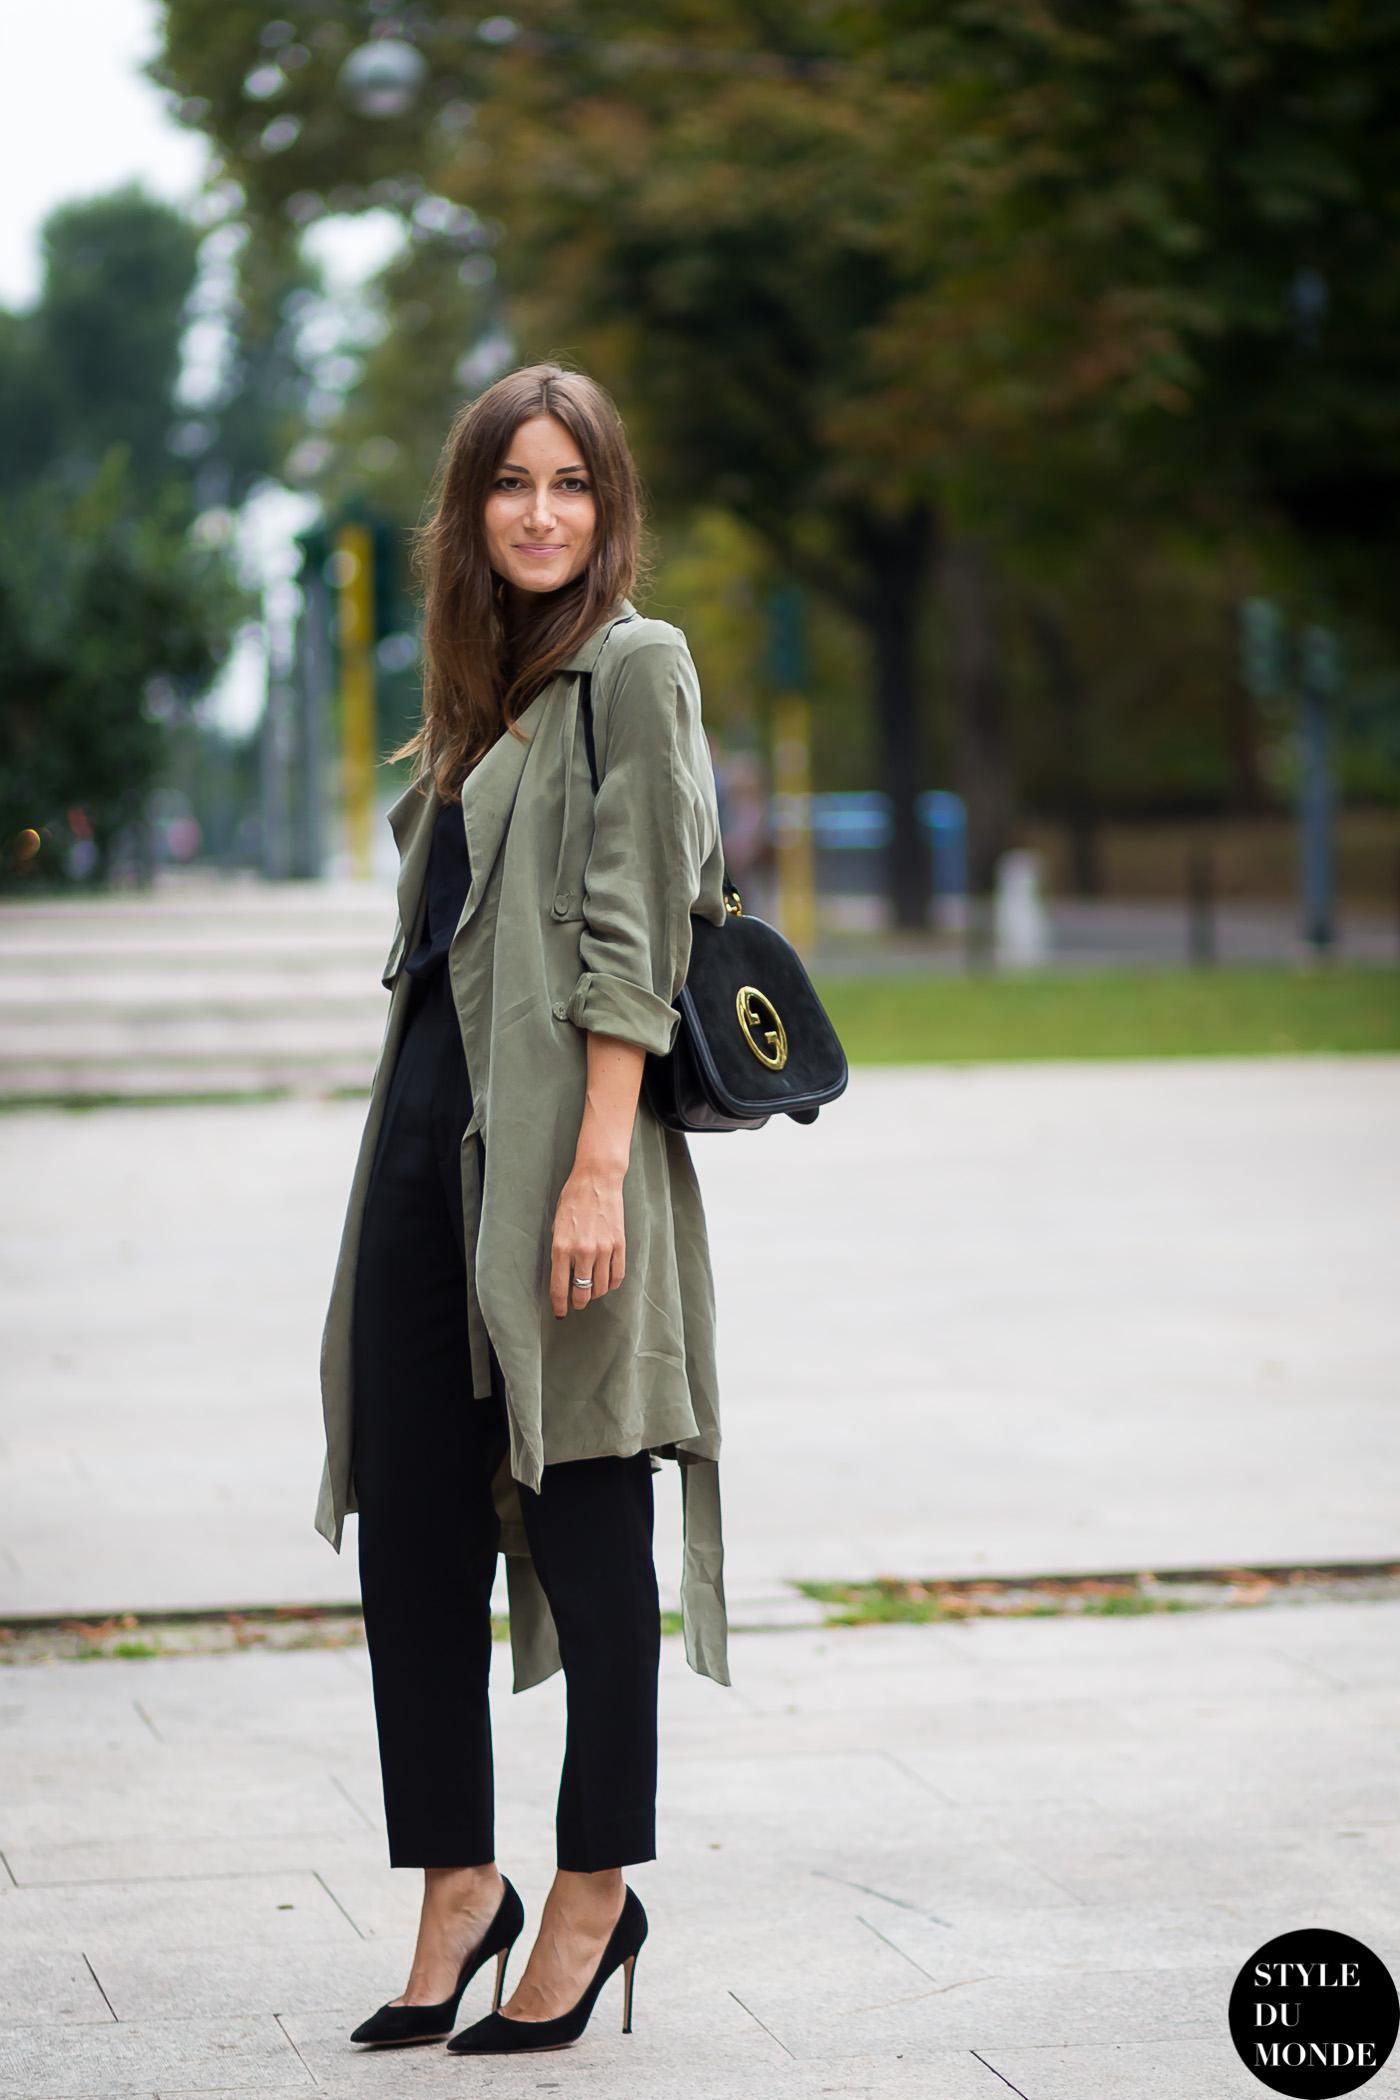 Giorgia-Tordini-by-STYLEDUMONDE-Street-Style-Fashion-Photography_MG_1724